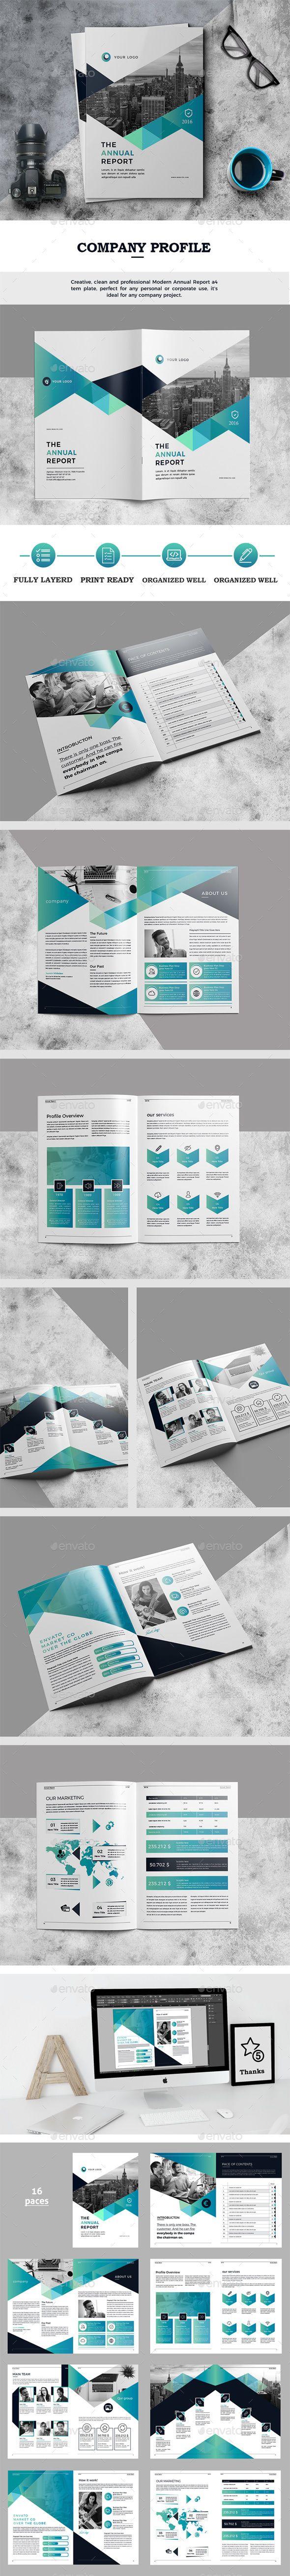 Brochure — InDesign INDD #brand #light • Download ➝ https://graphicriver.net/item/brochure/19060211?ref=pxcr